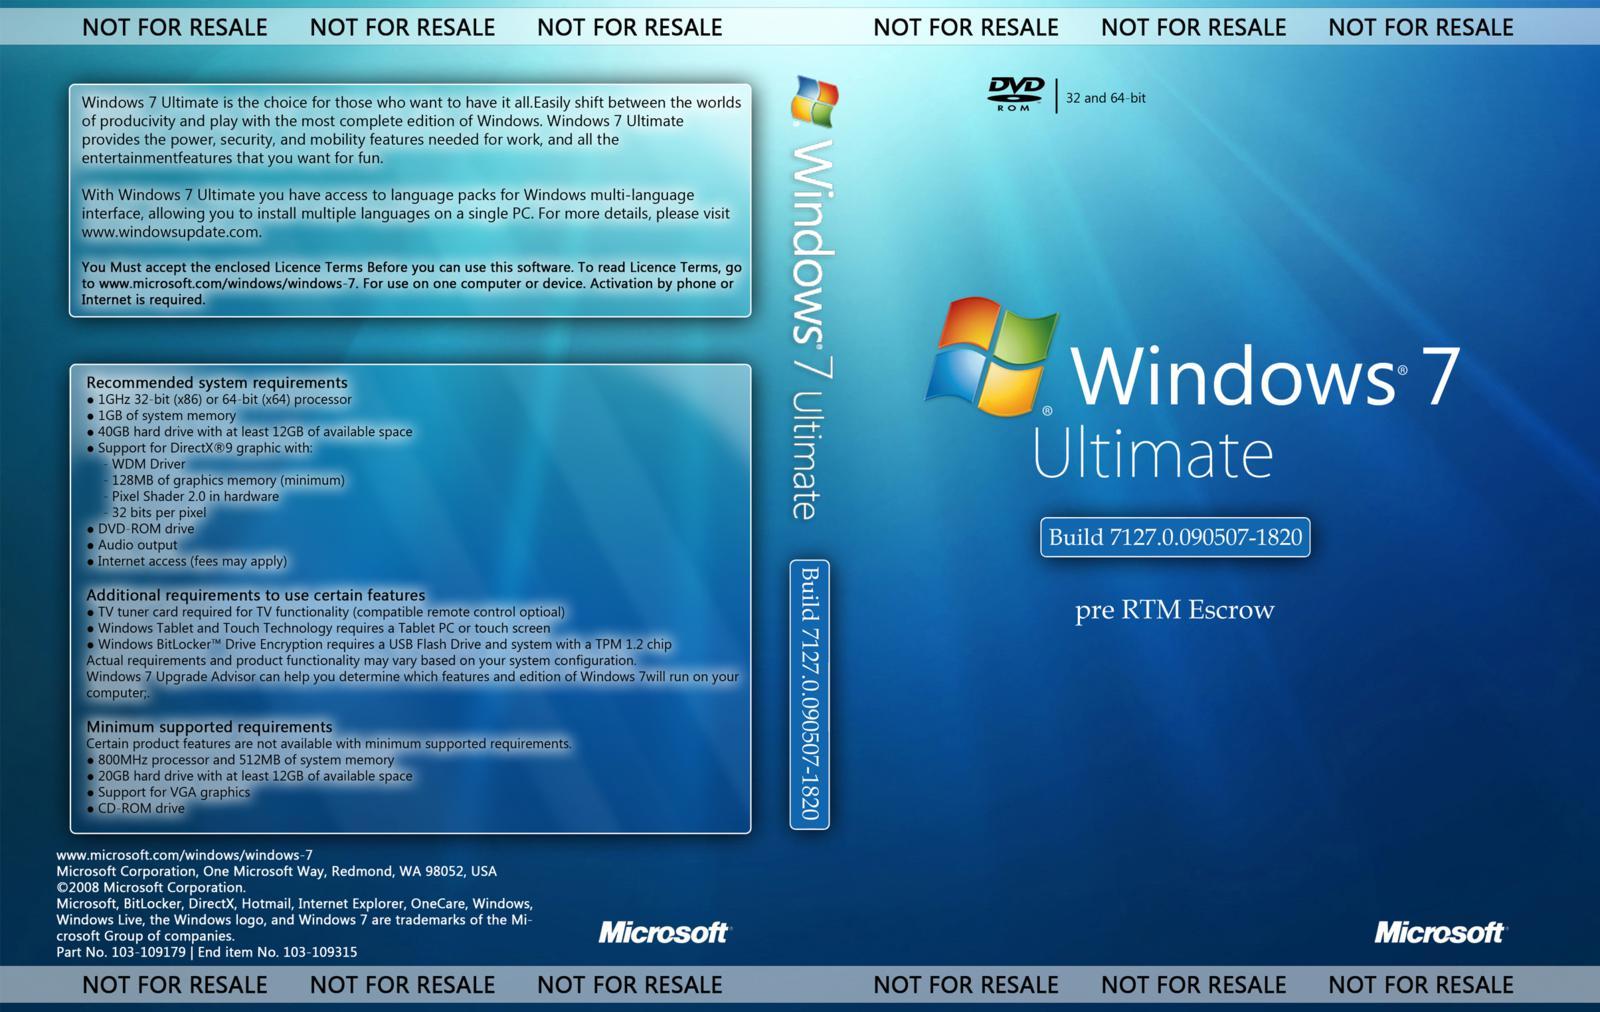 Windows 7 Full Version  bit/64-bit Free Download - Softwalay